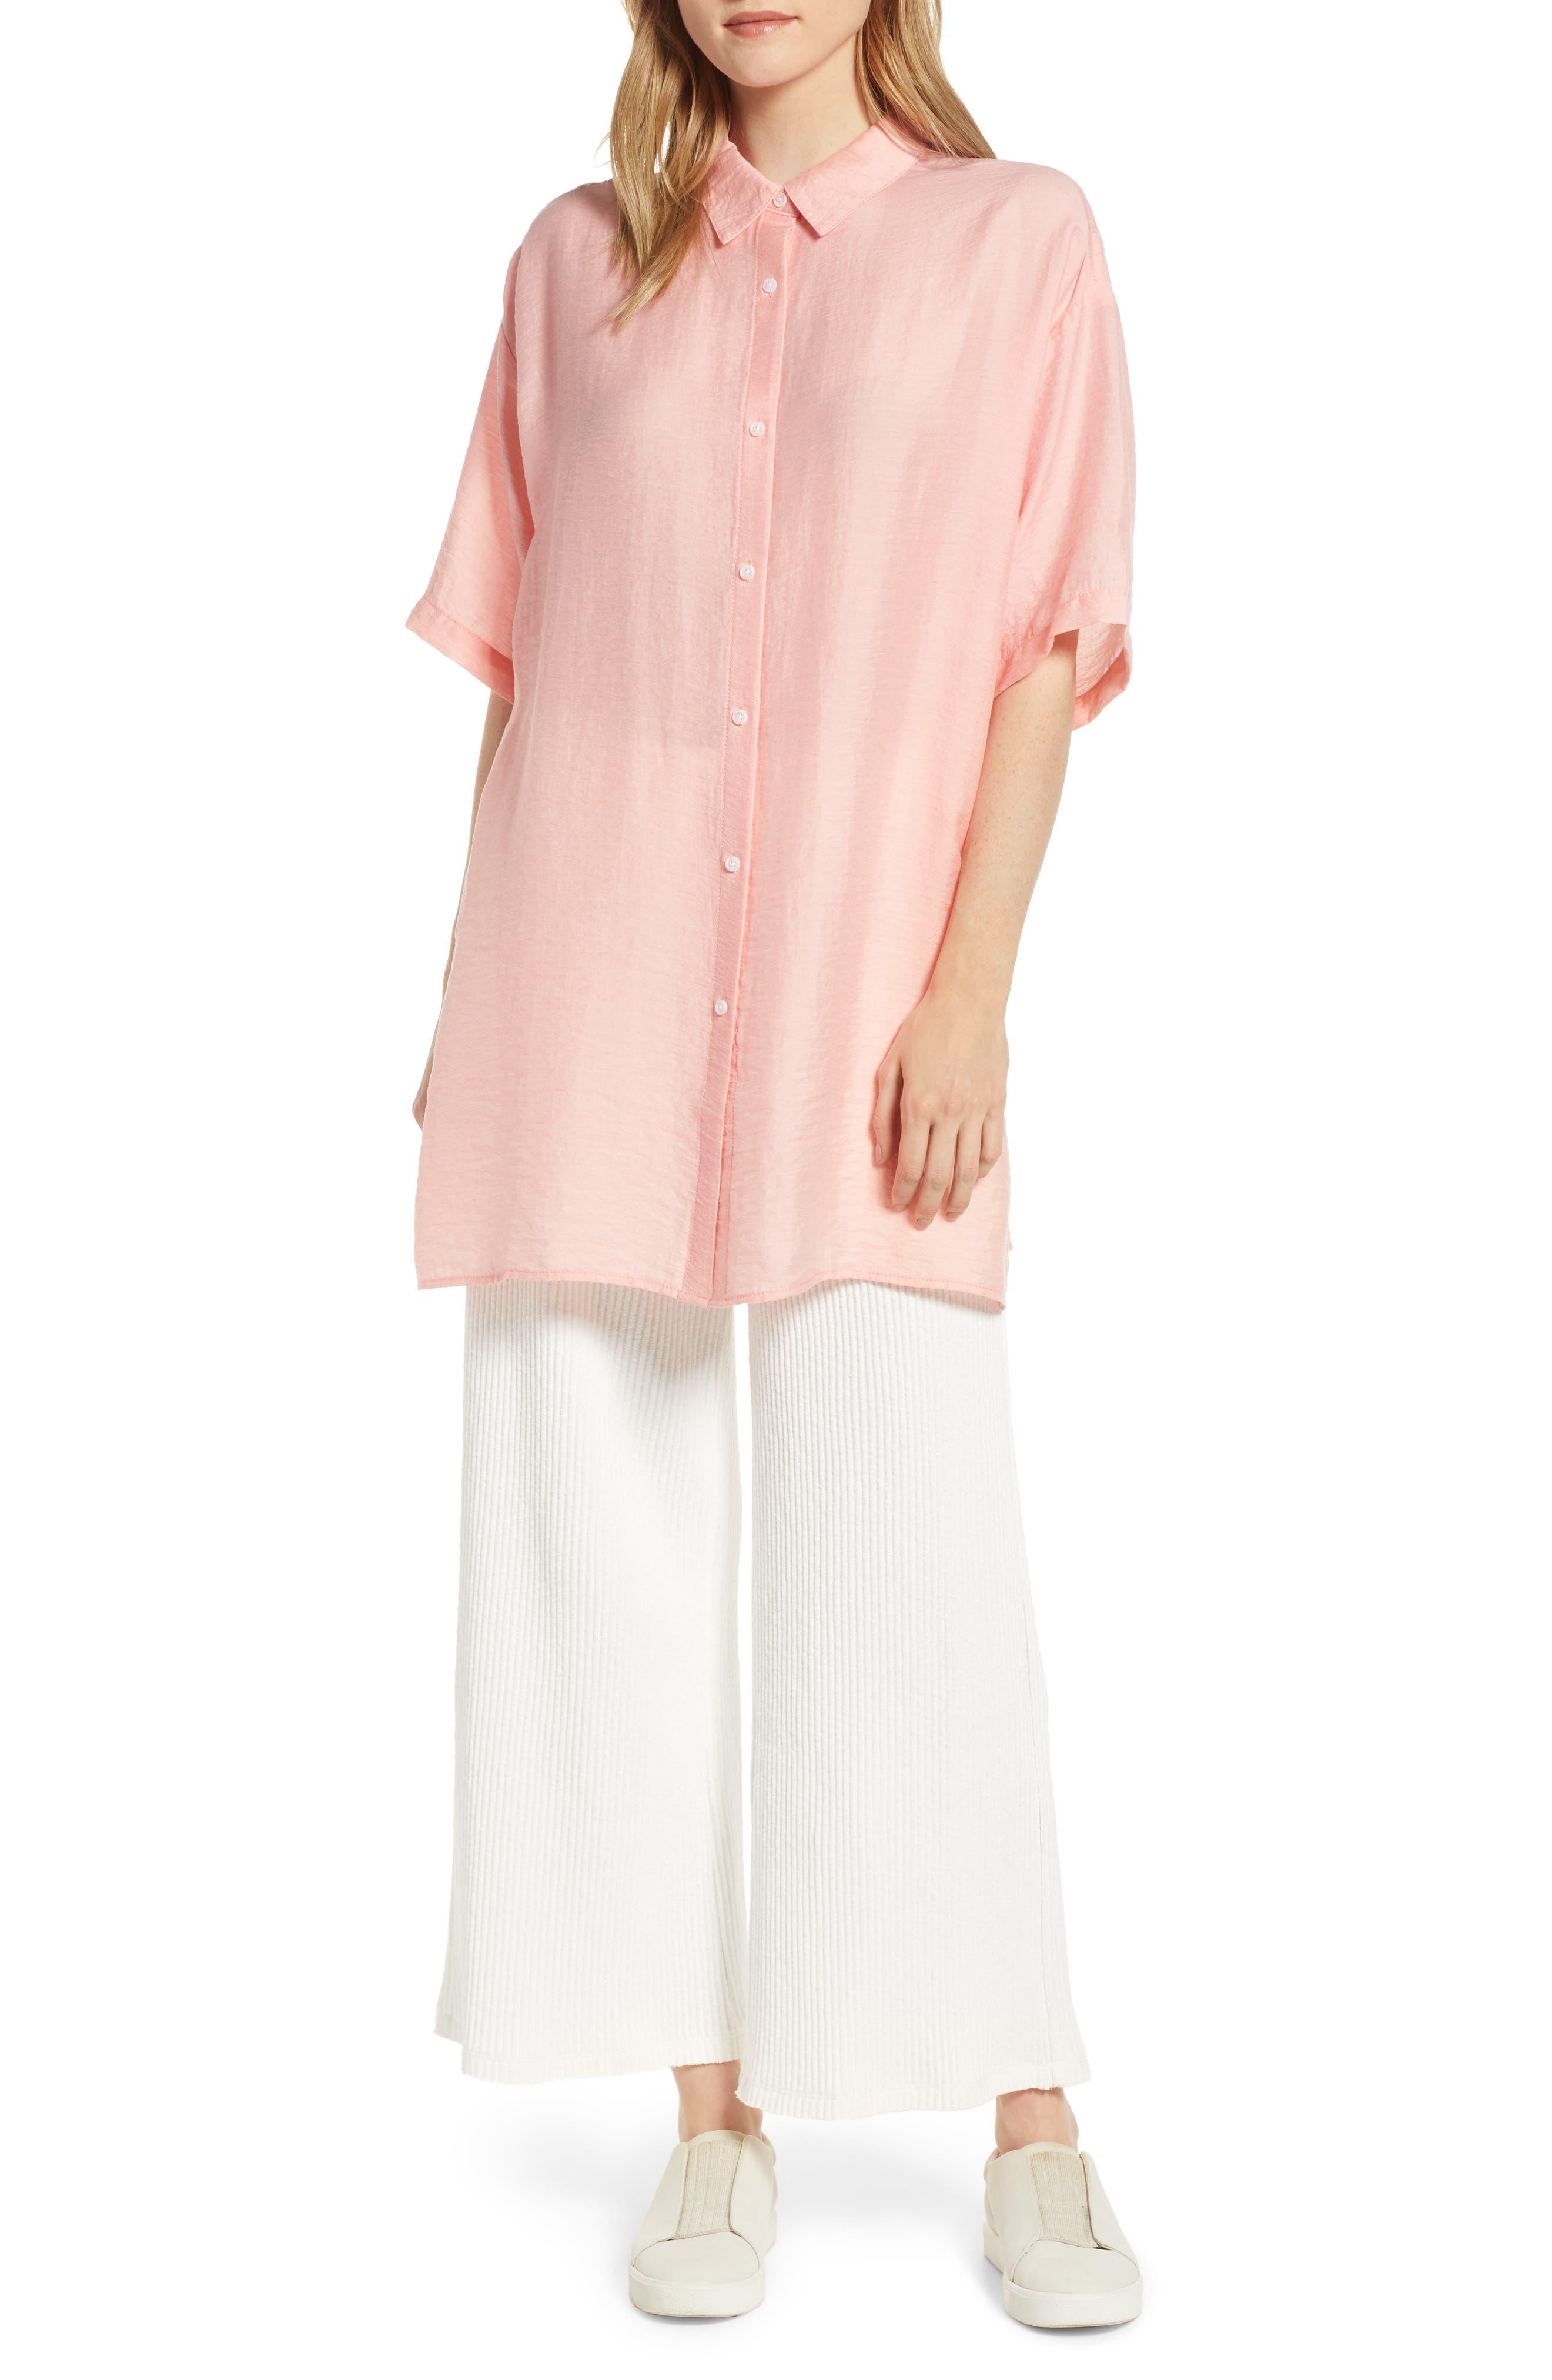 Lou & Grey Twill Shirtdress, Pink